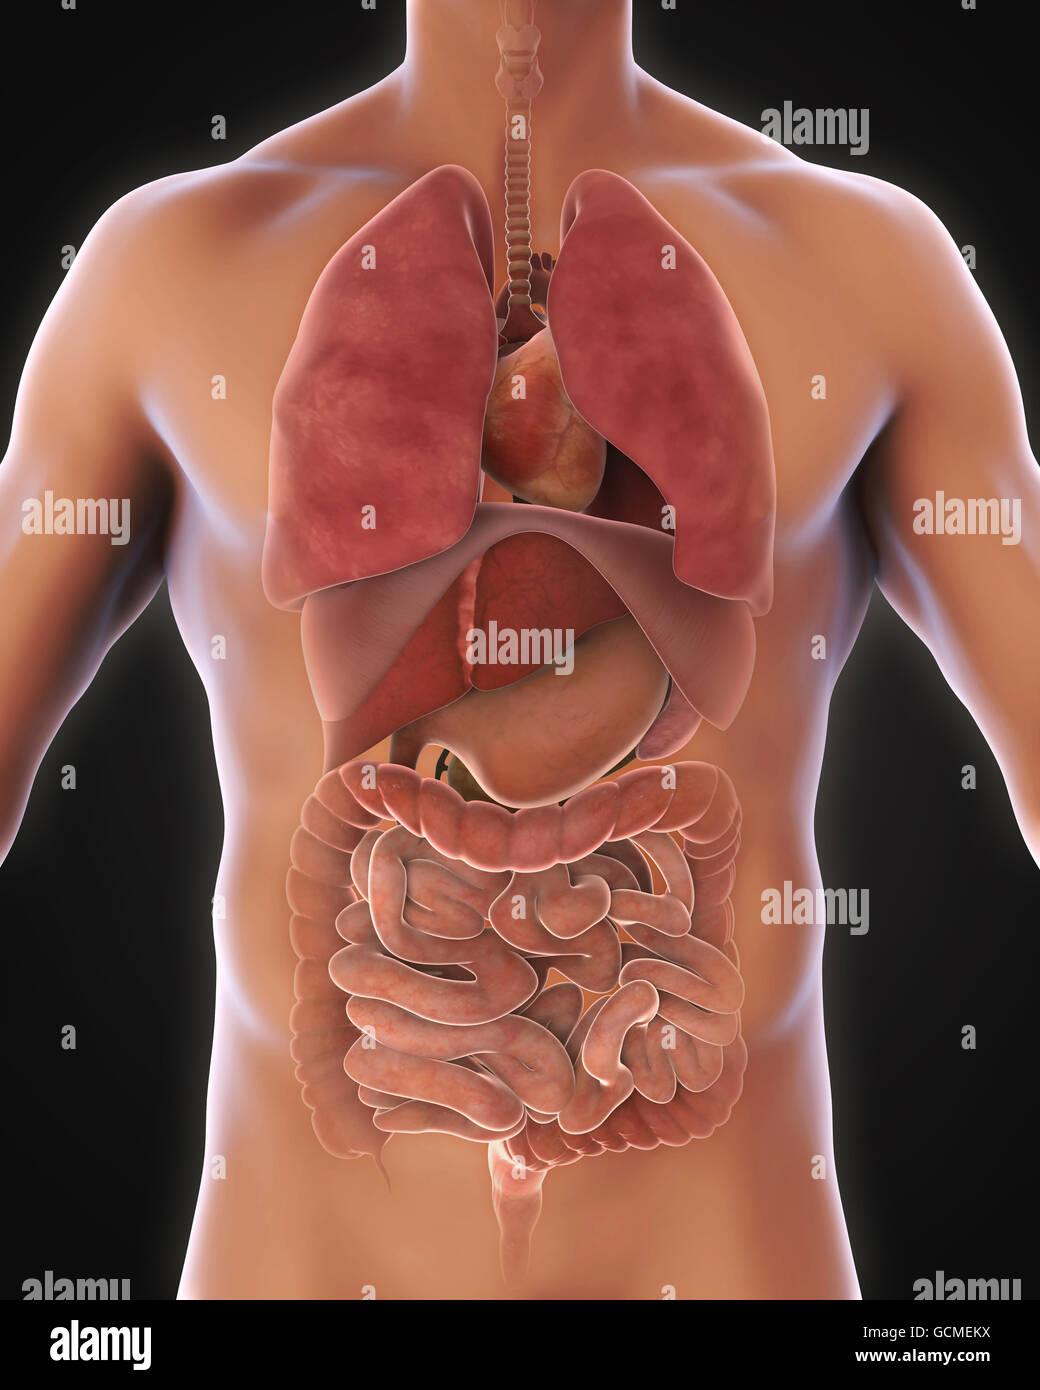 Anterior View of Human Body - Stock Image